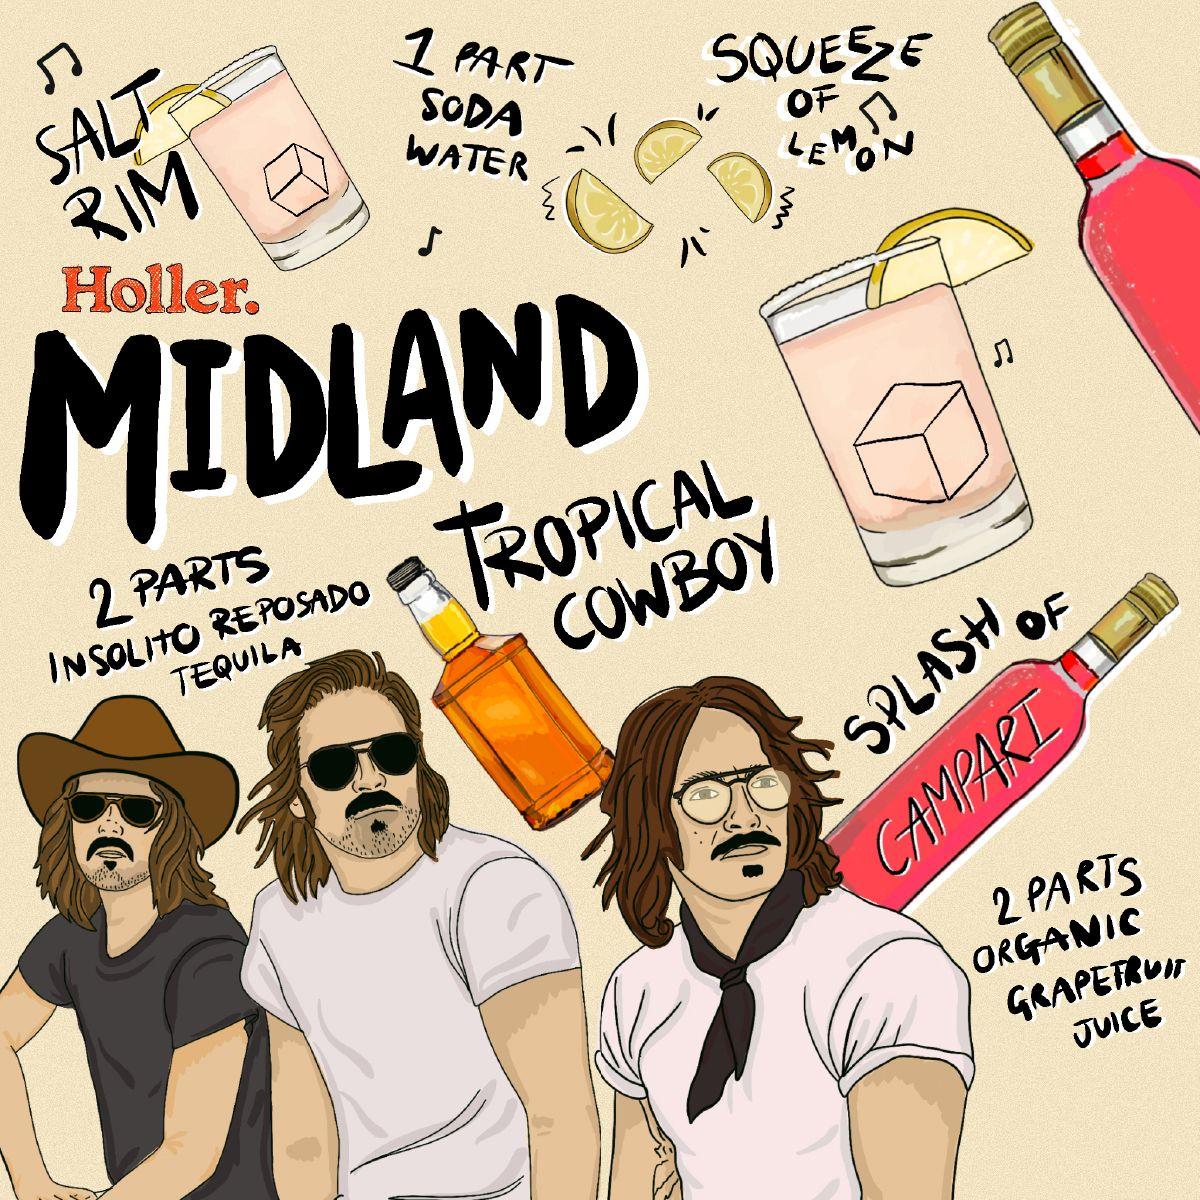 Graphic - Midland - Holler CC